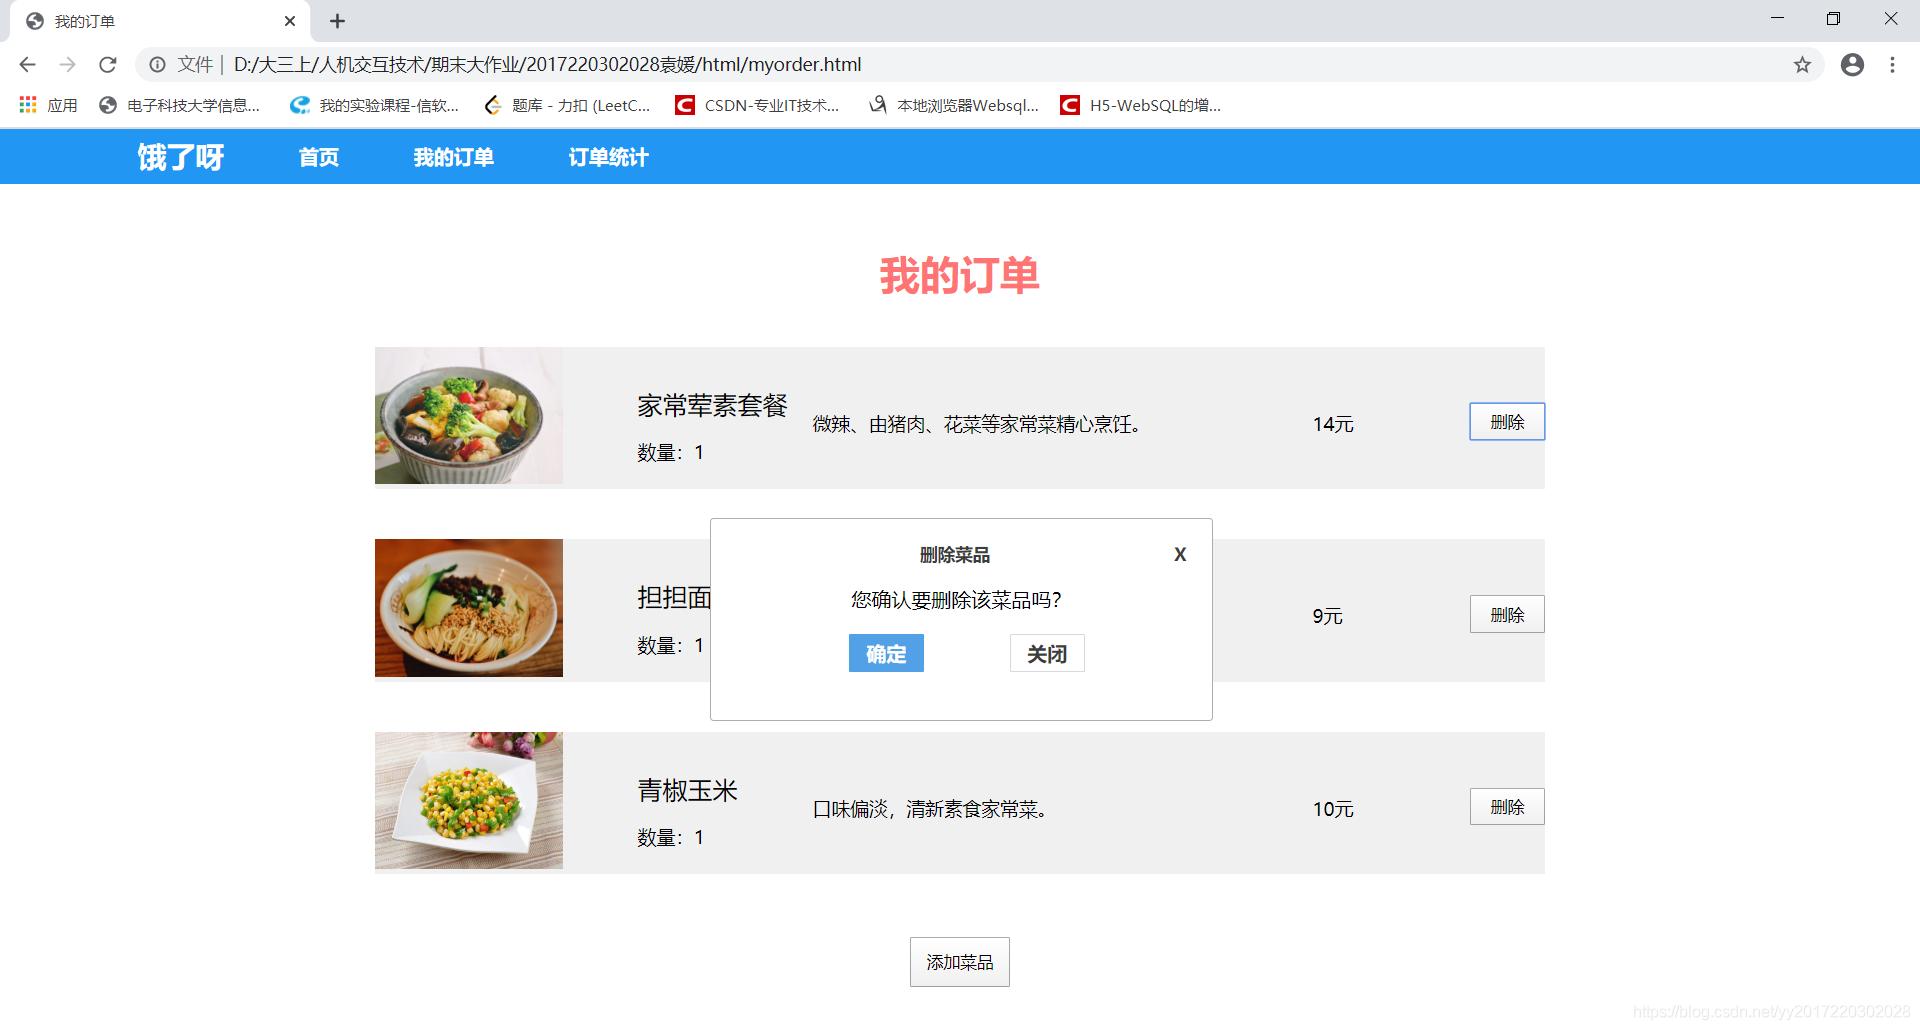 html5网站源码下载 定单(html5网站源码带后台) (https://www.oilcn.net.cn/) 综合教程 第6张